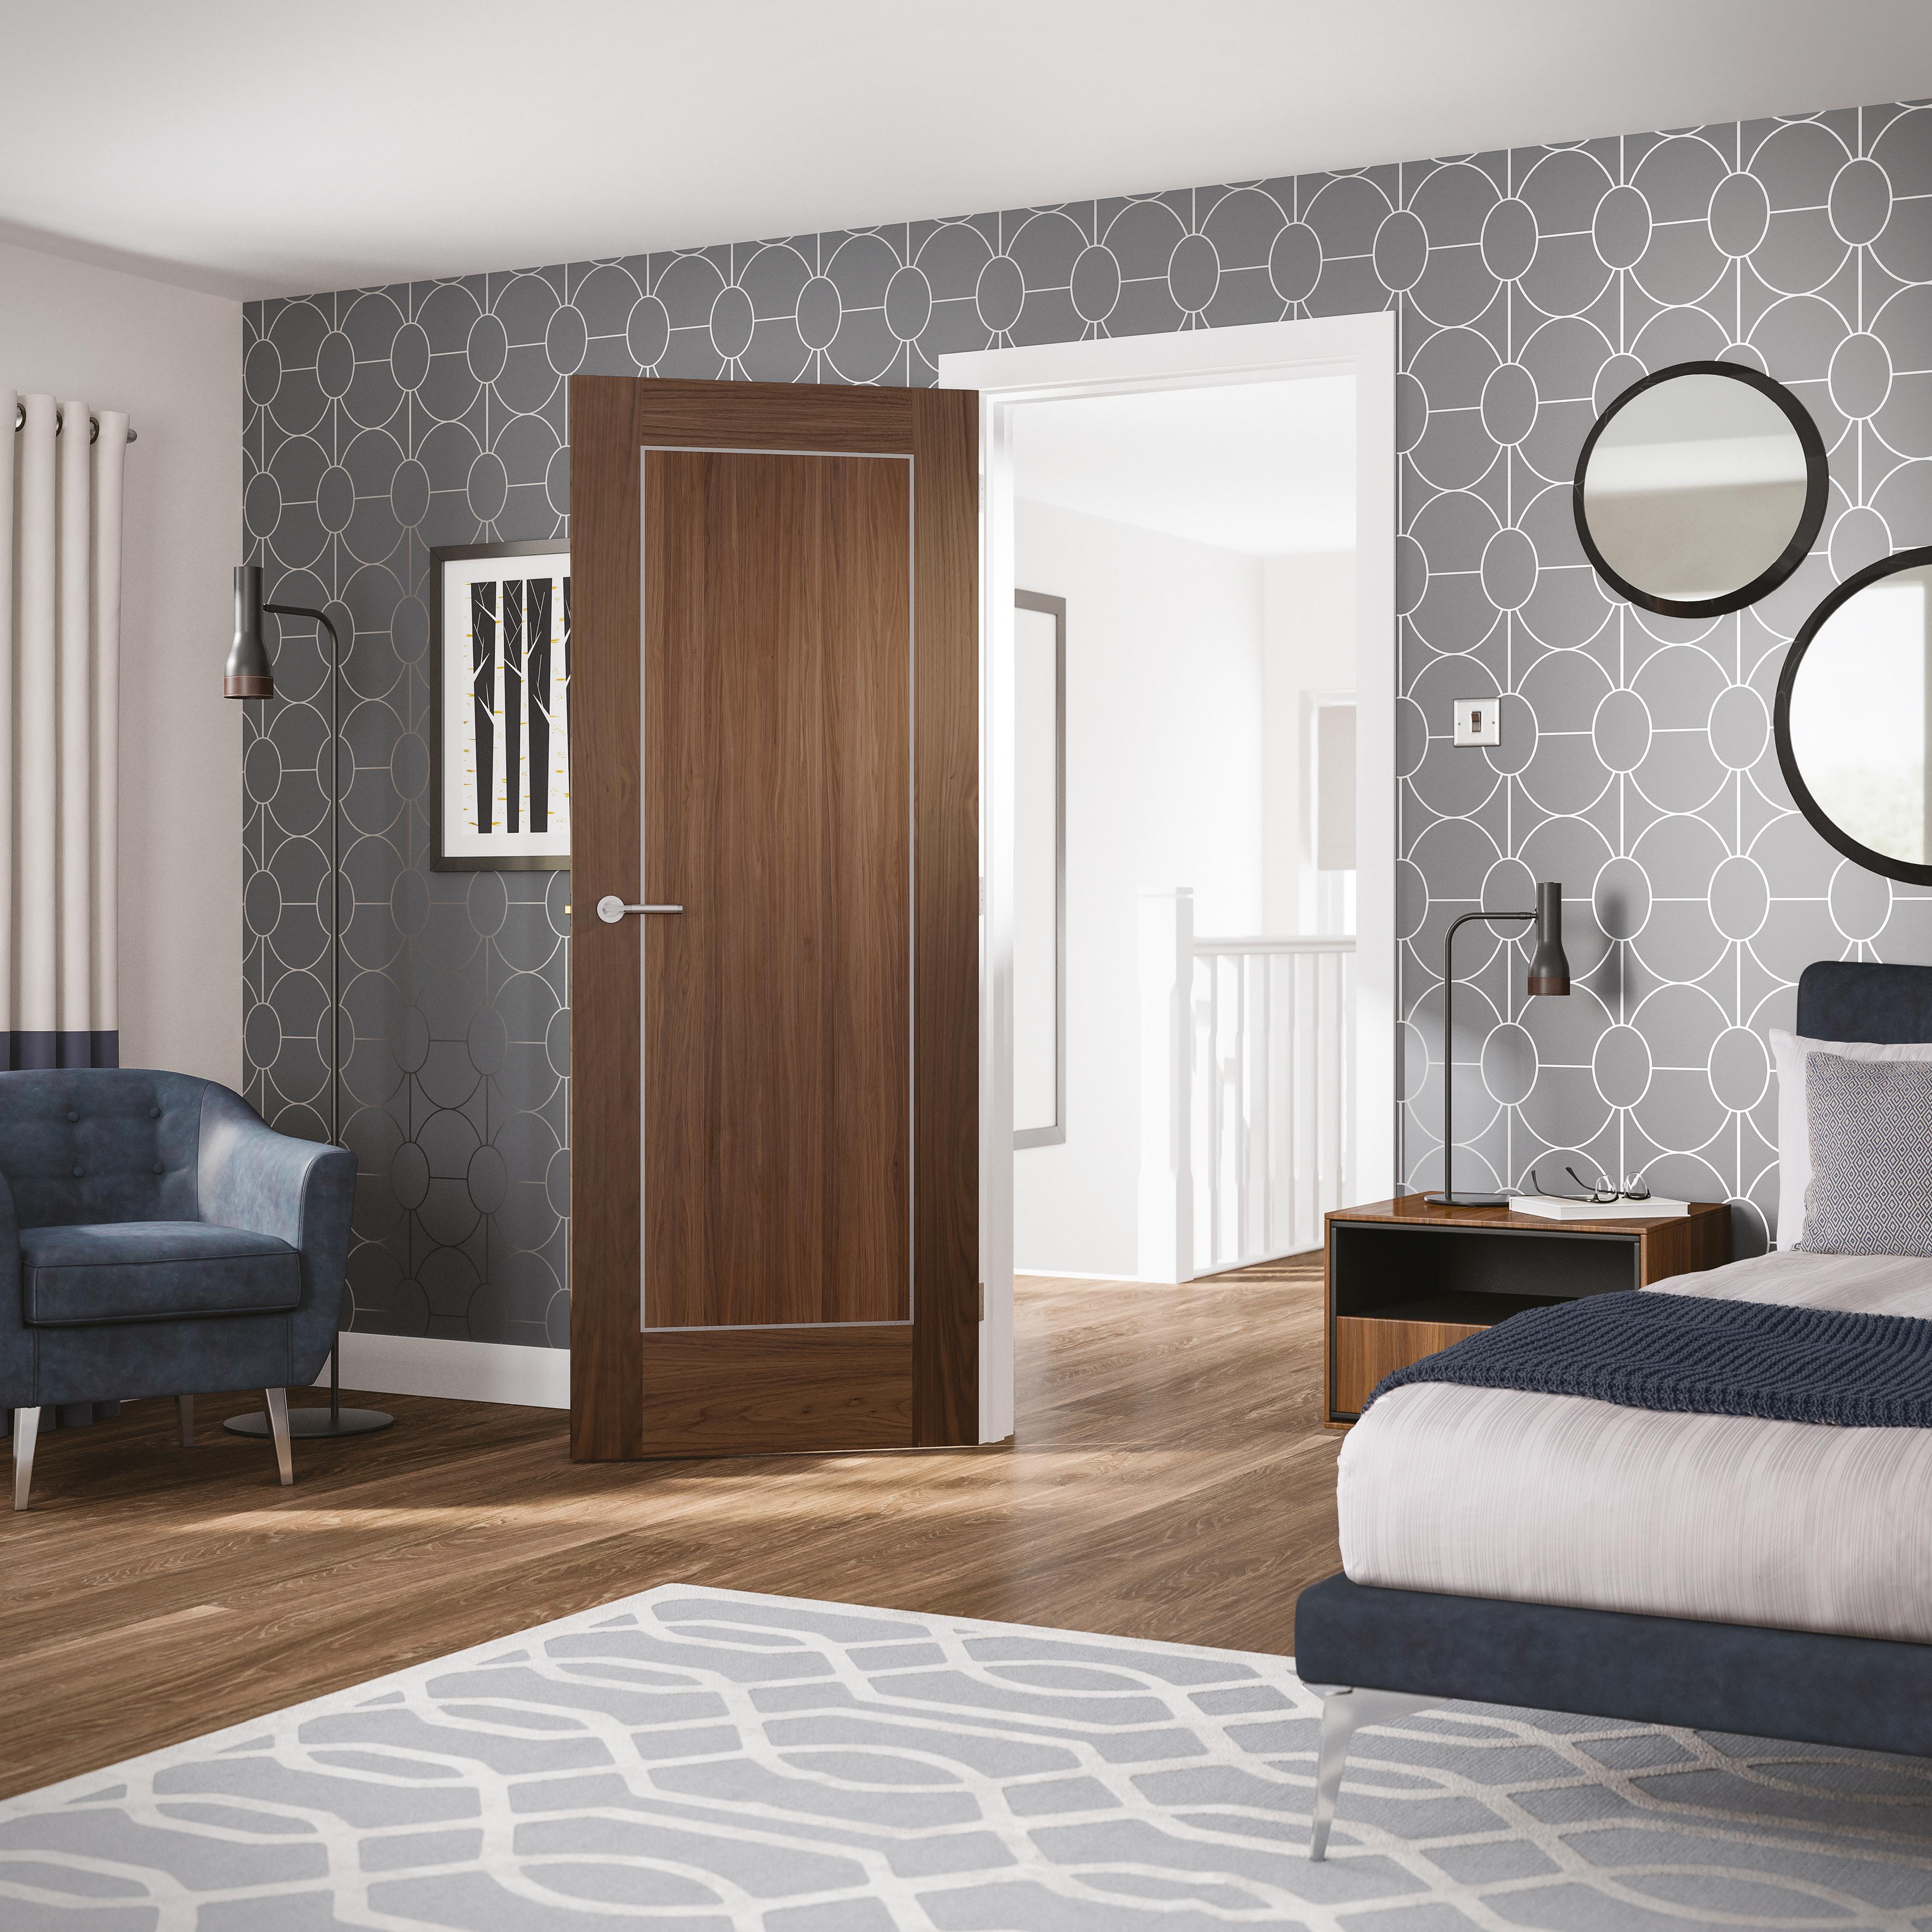 Doorworld internal doors cheshire